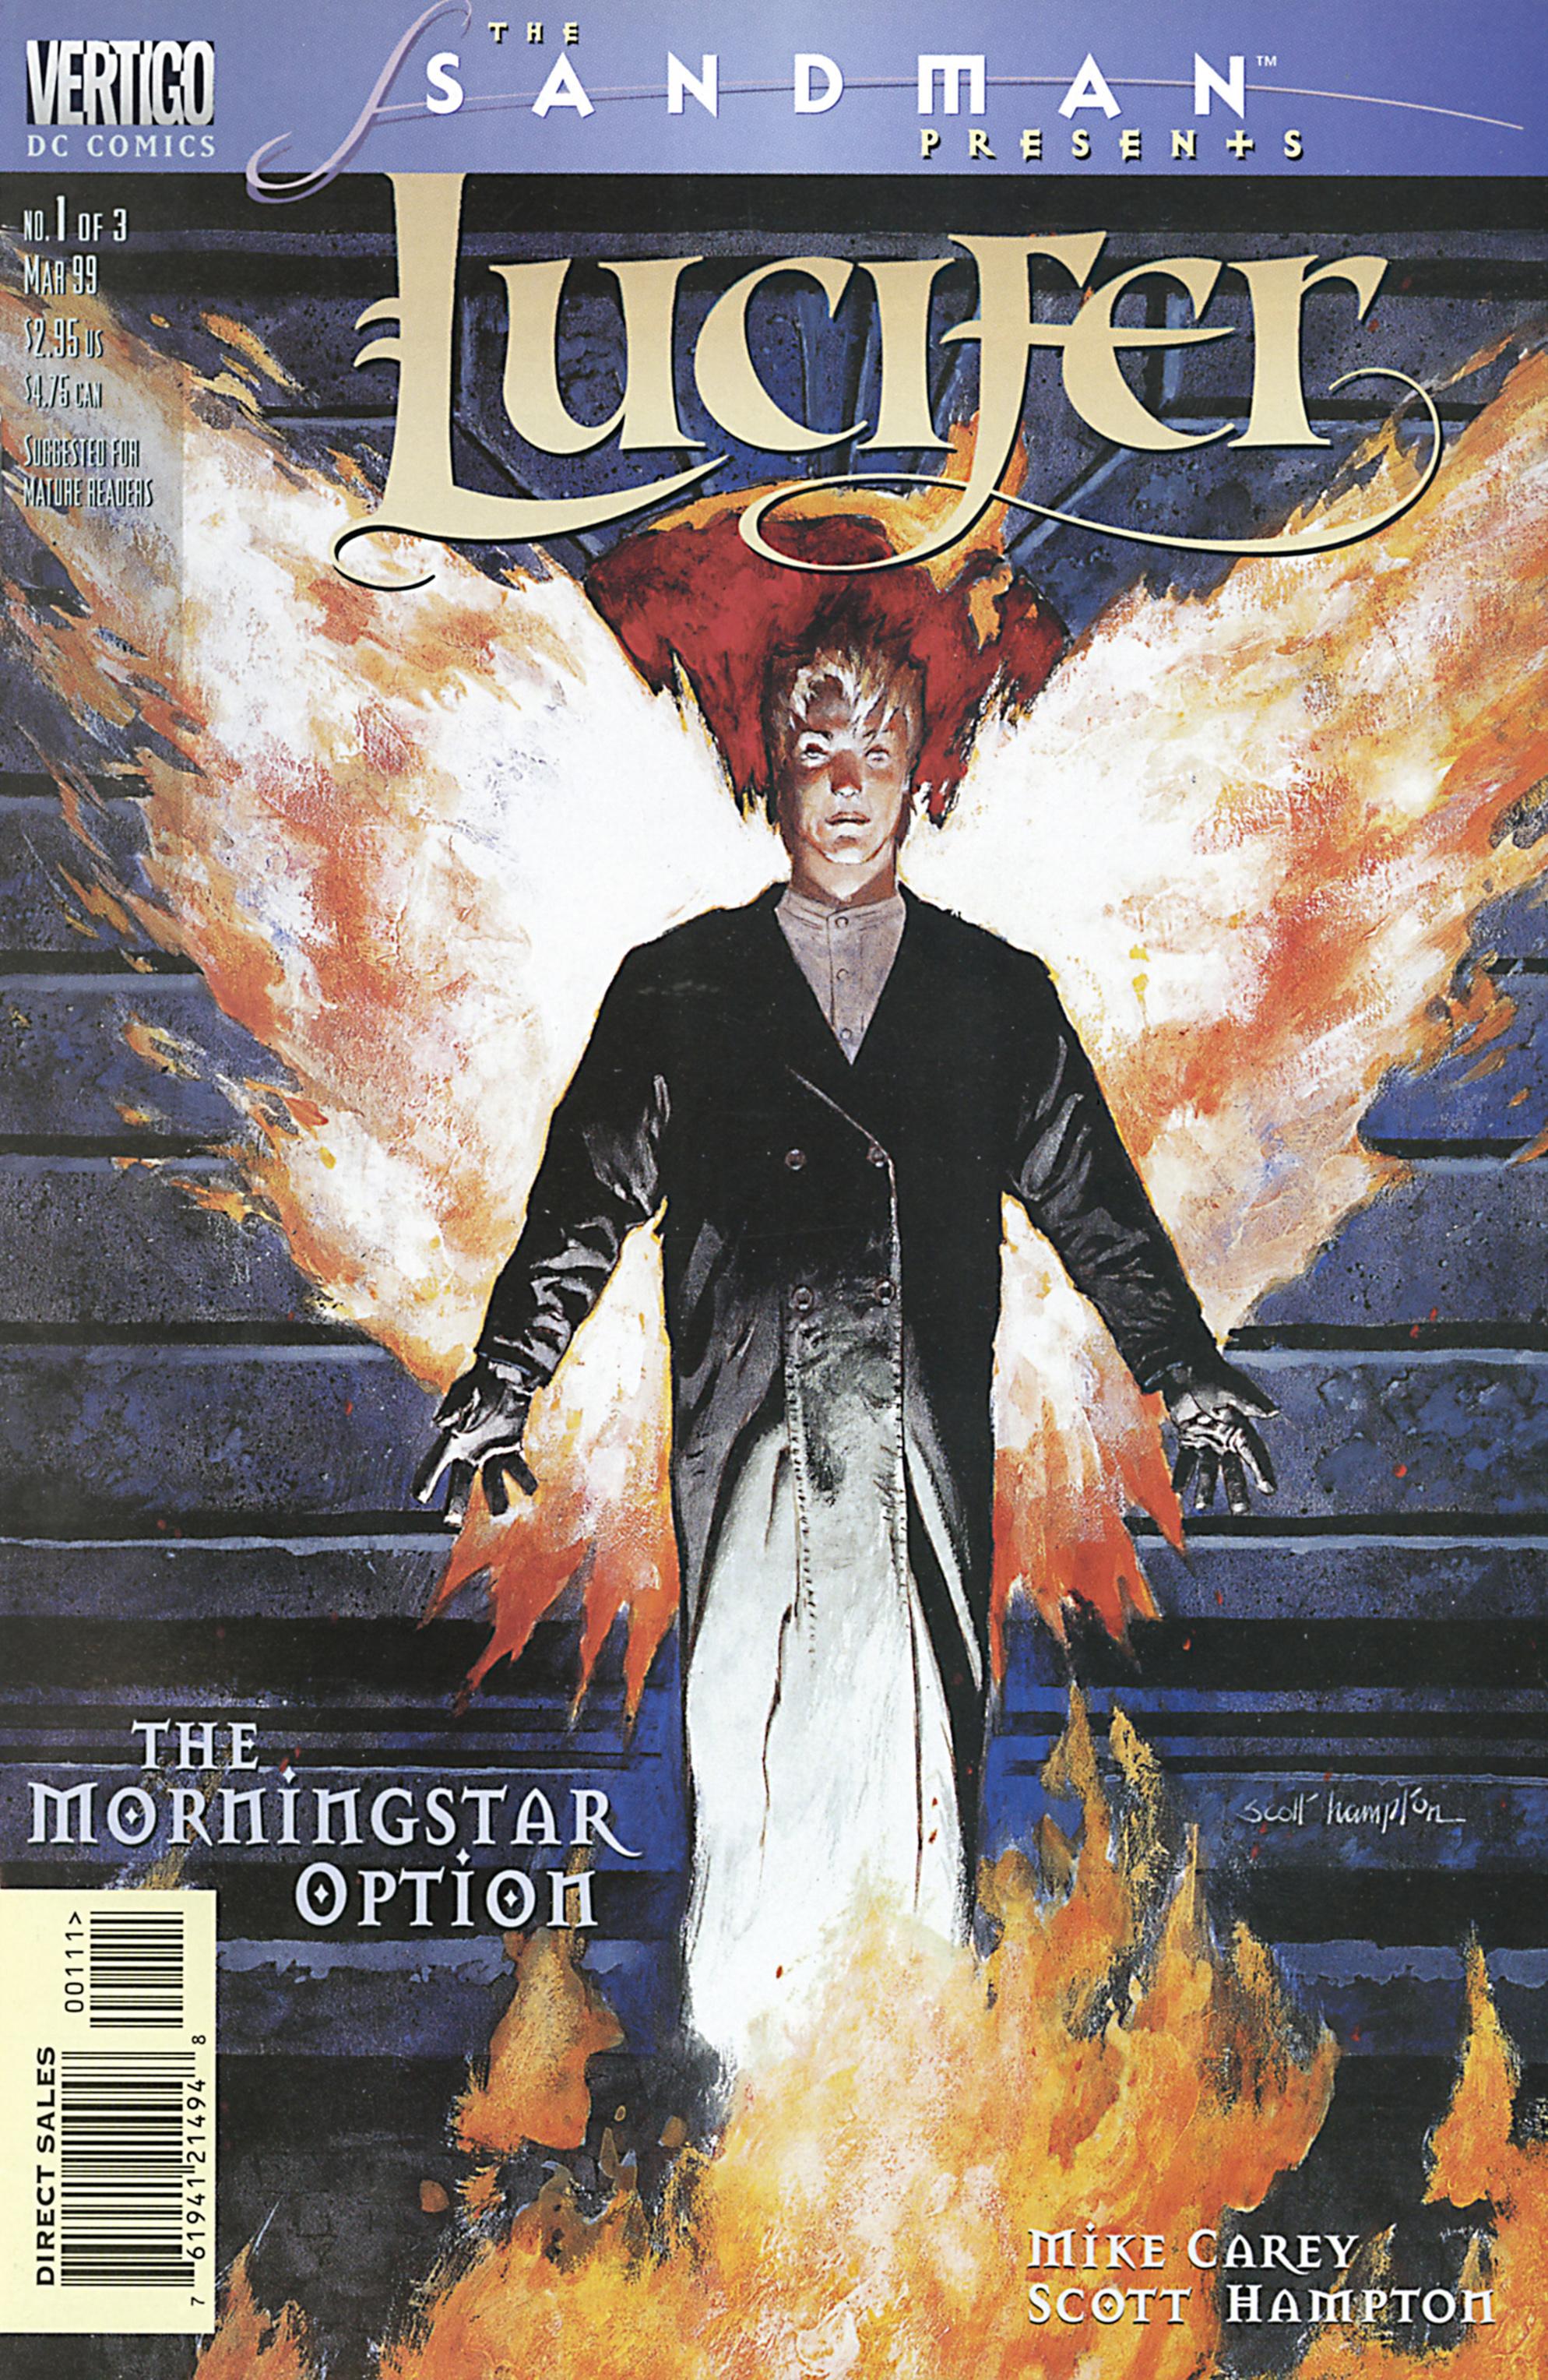 Sandman Presents: Lucifer issue 1 - Page 1